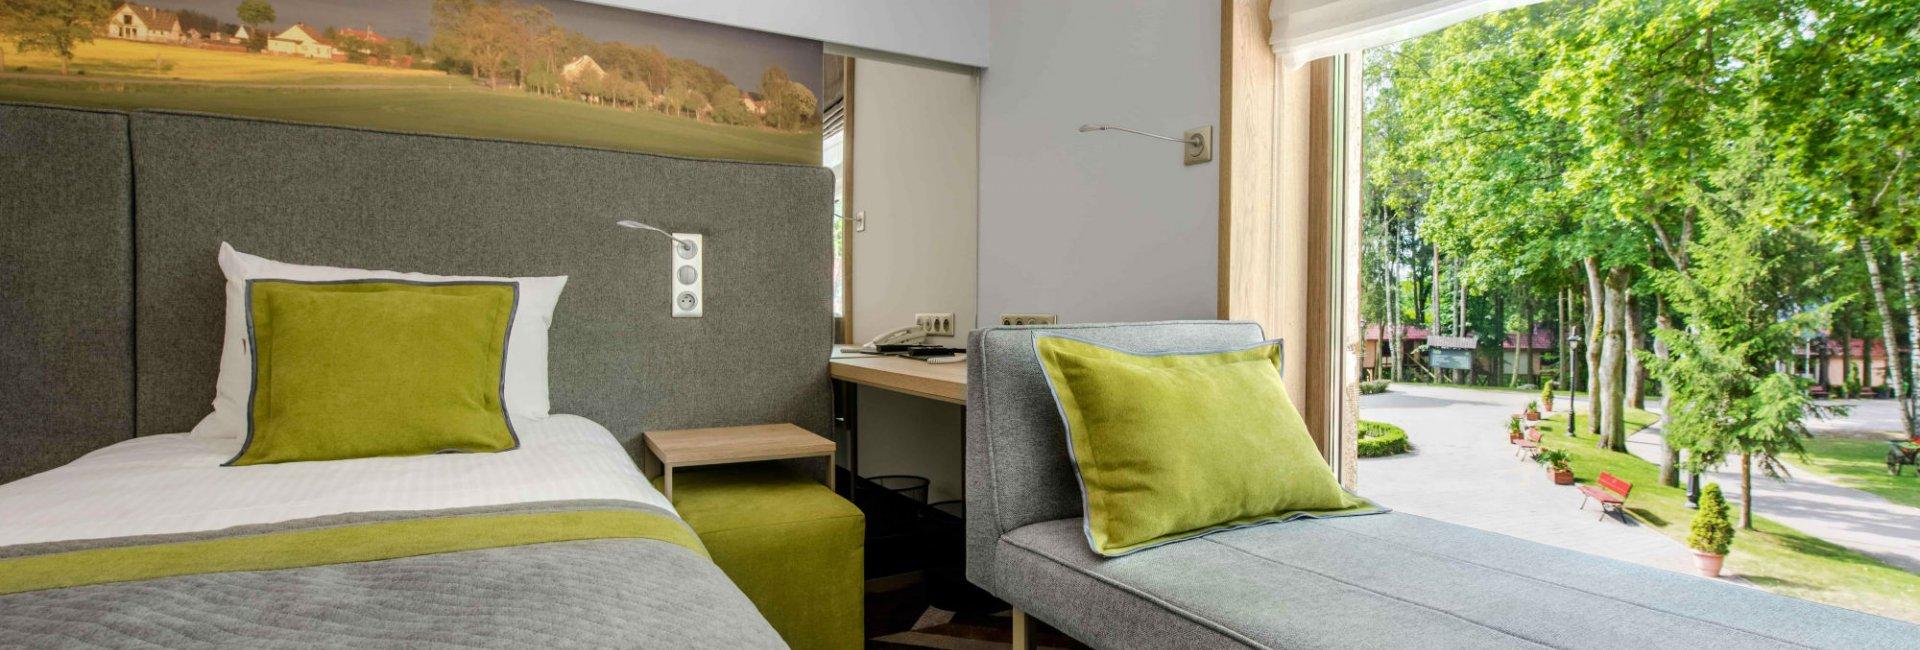 Nowe pokoje i sale konferencyjne na 25-lecie Hotelu Anders